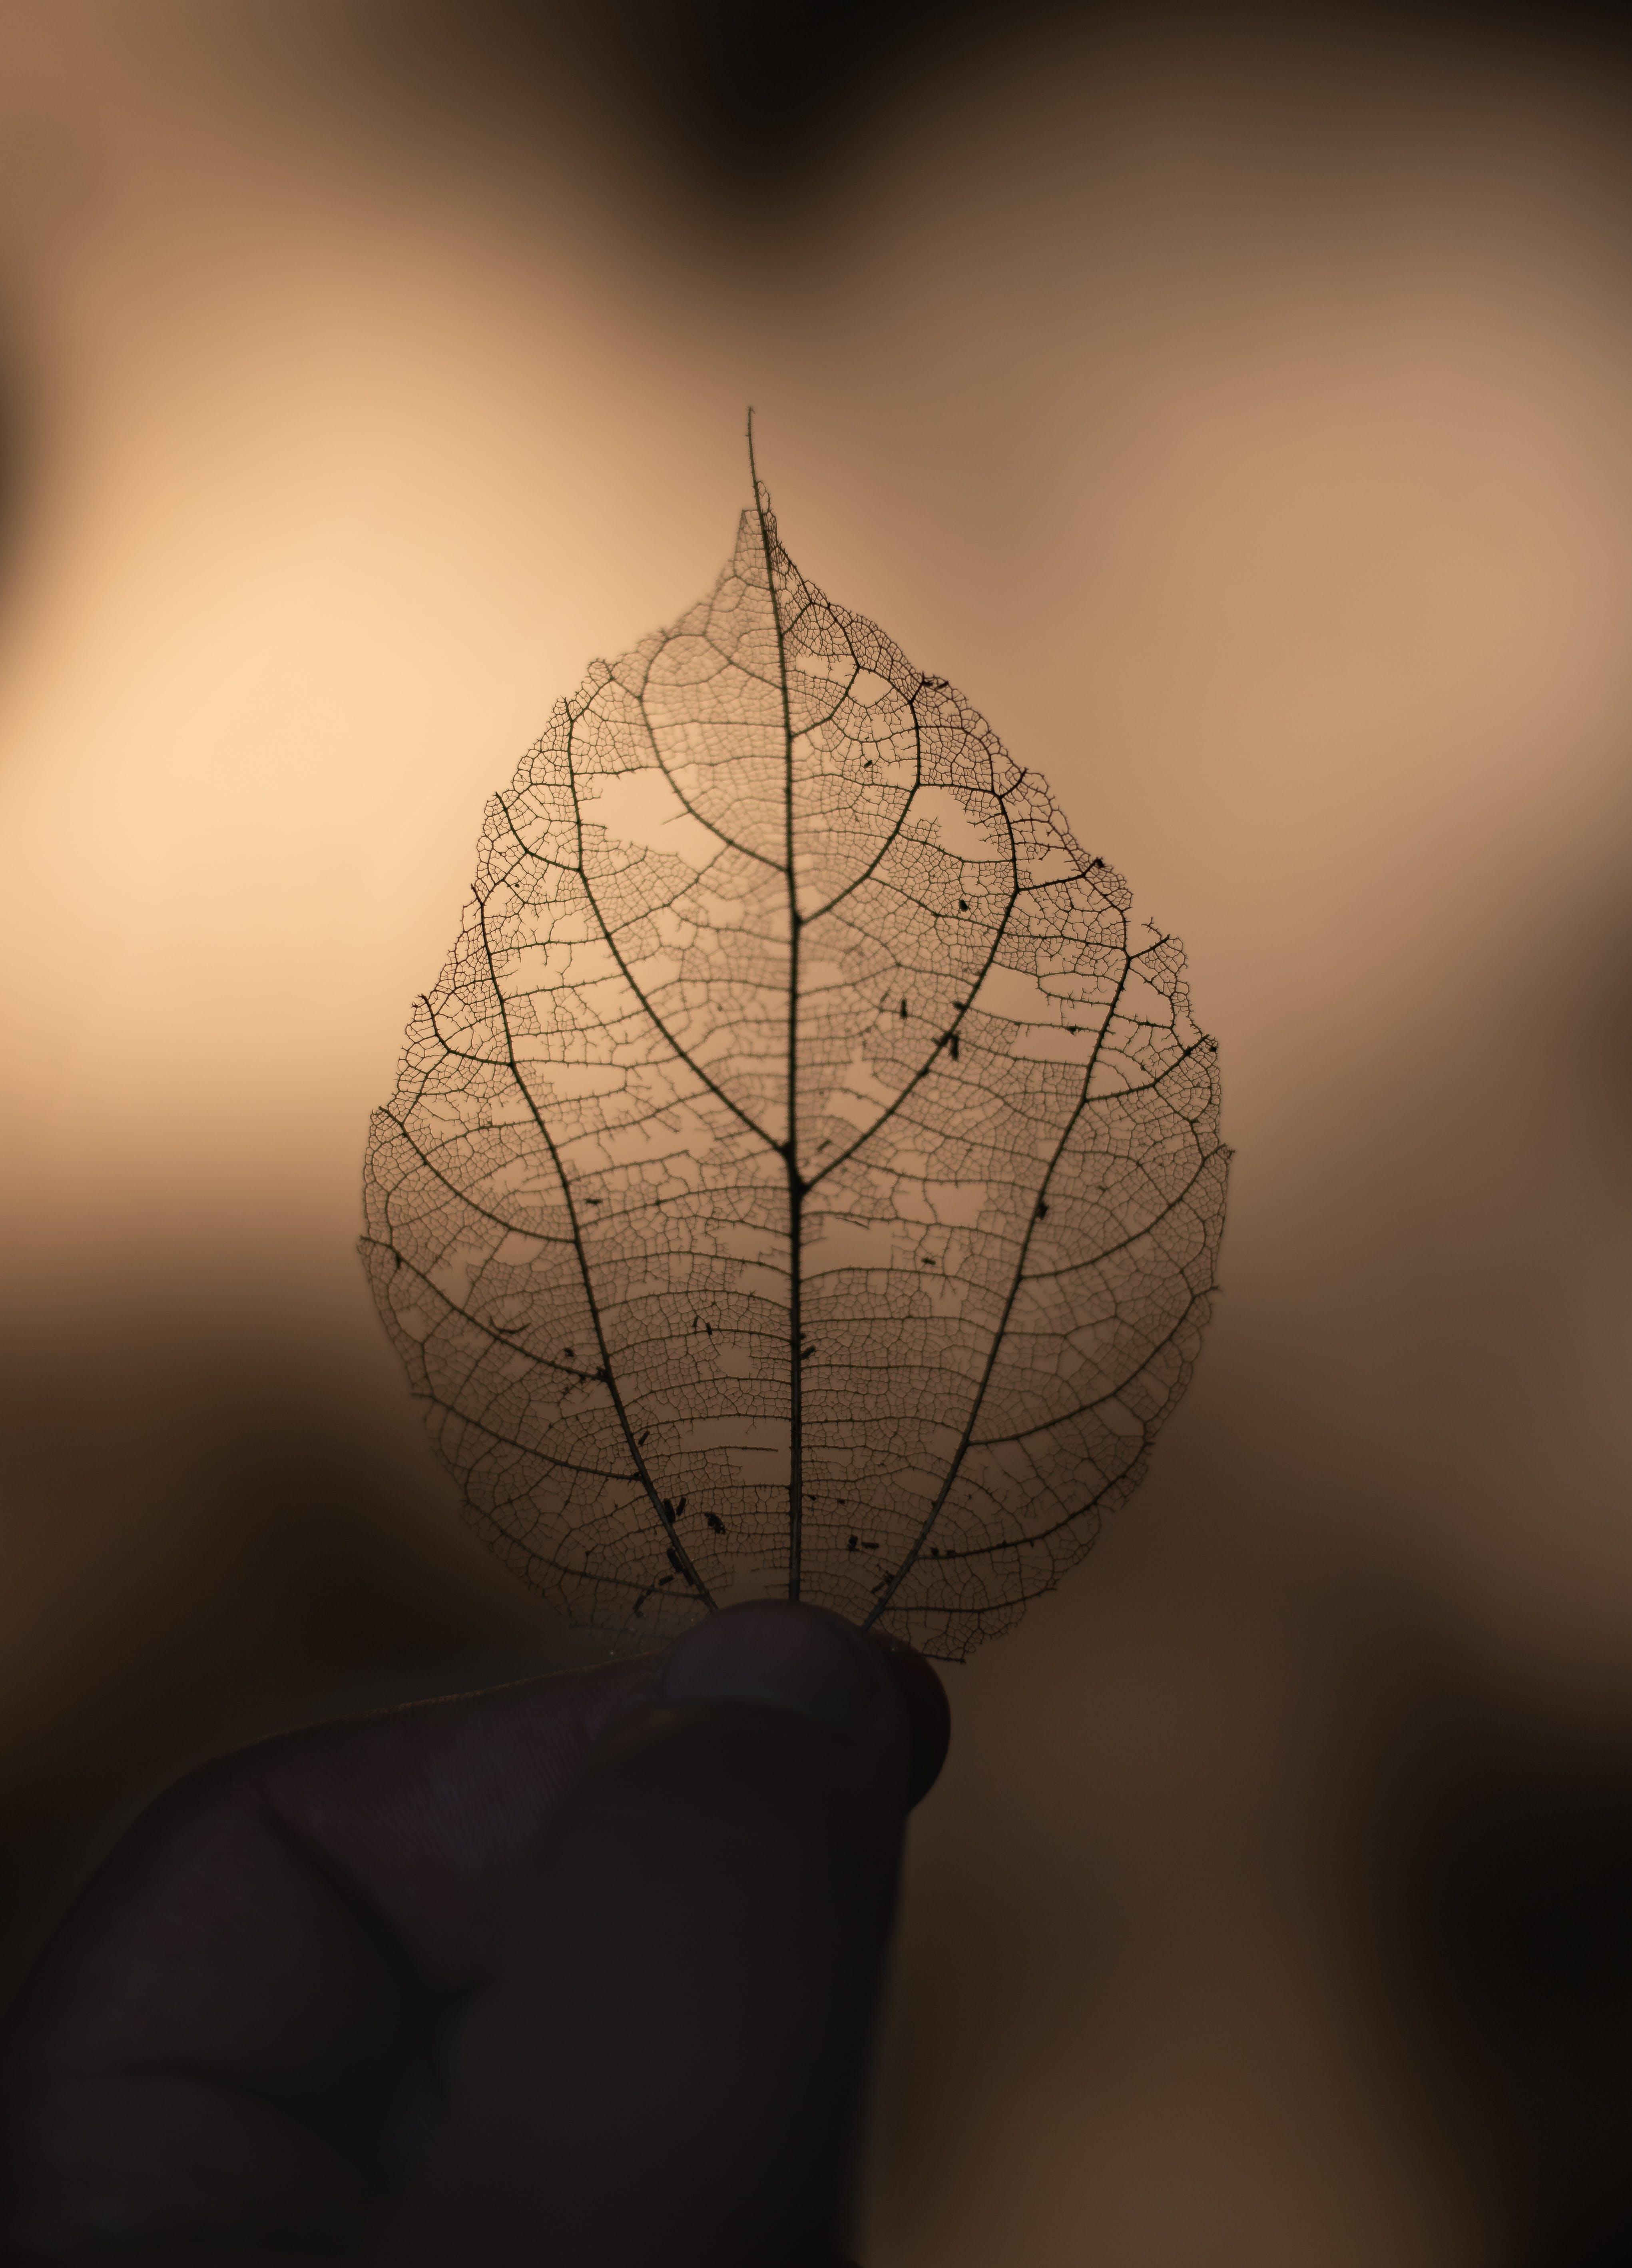 Dry Leaf On Focus Photography